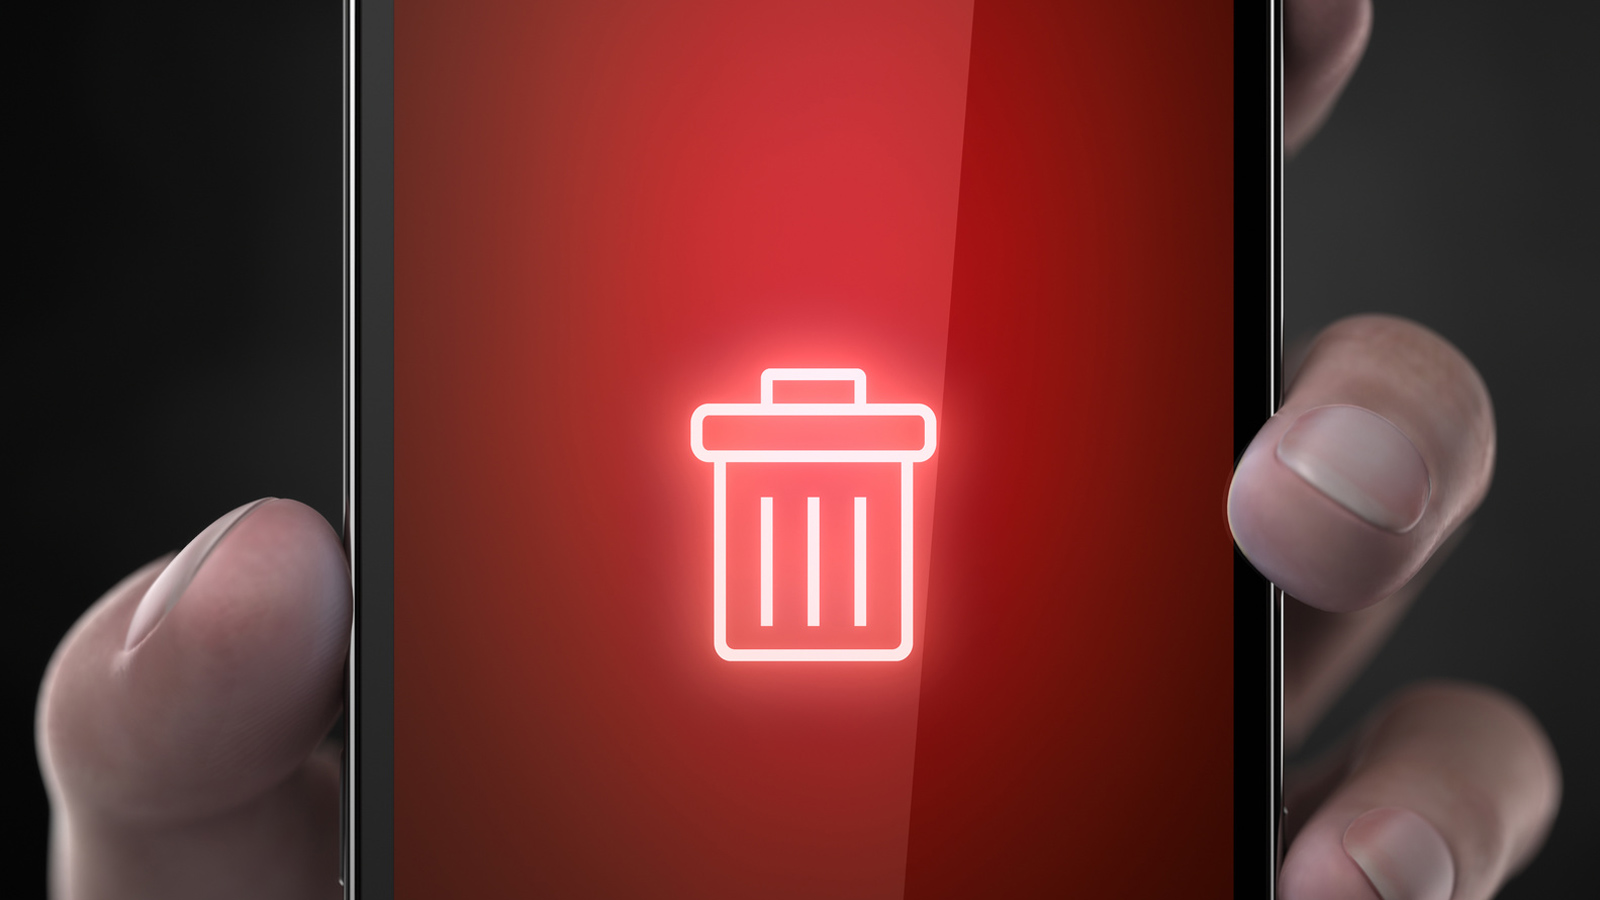 Android Smarphone Daten löschen